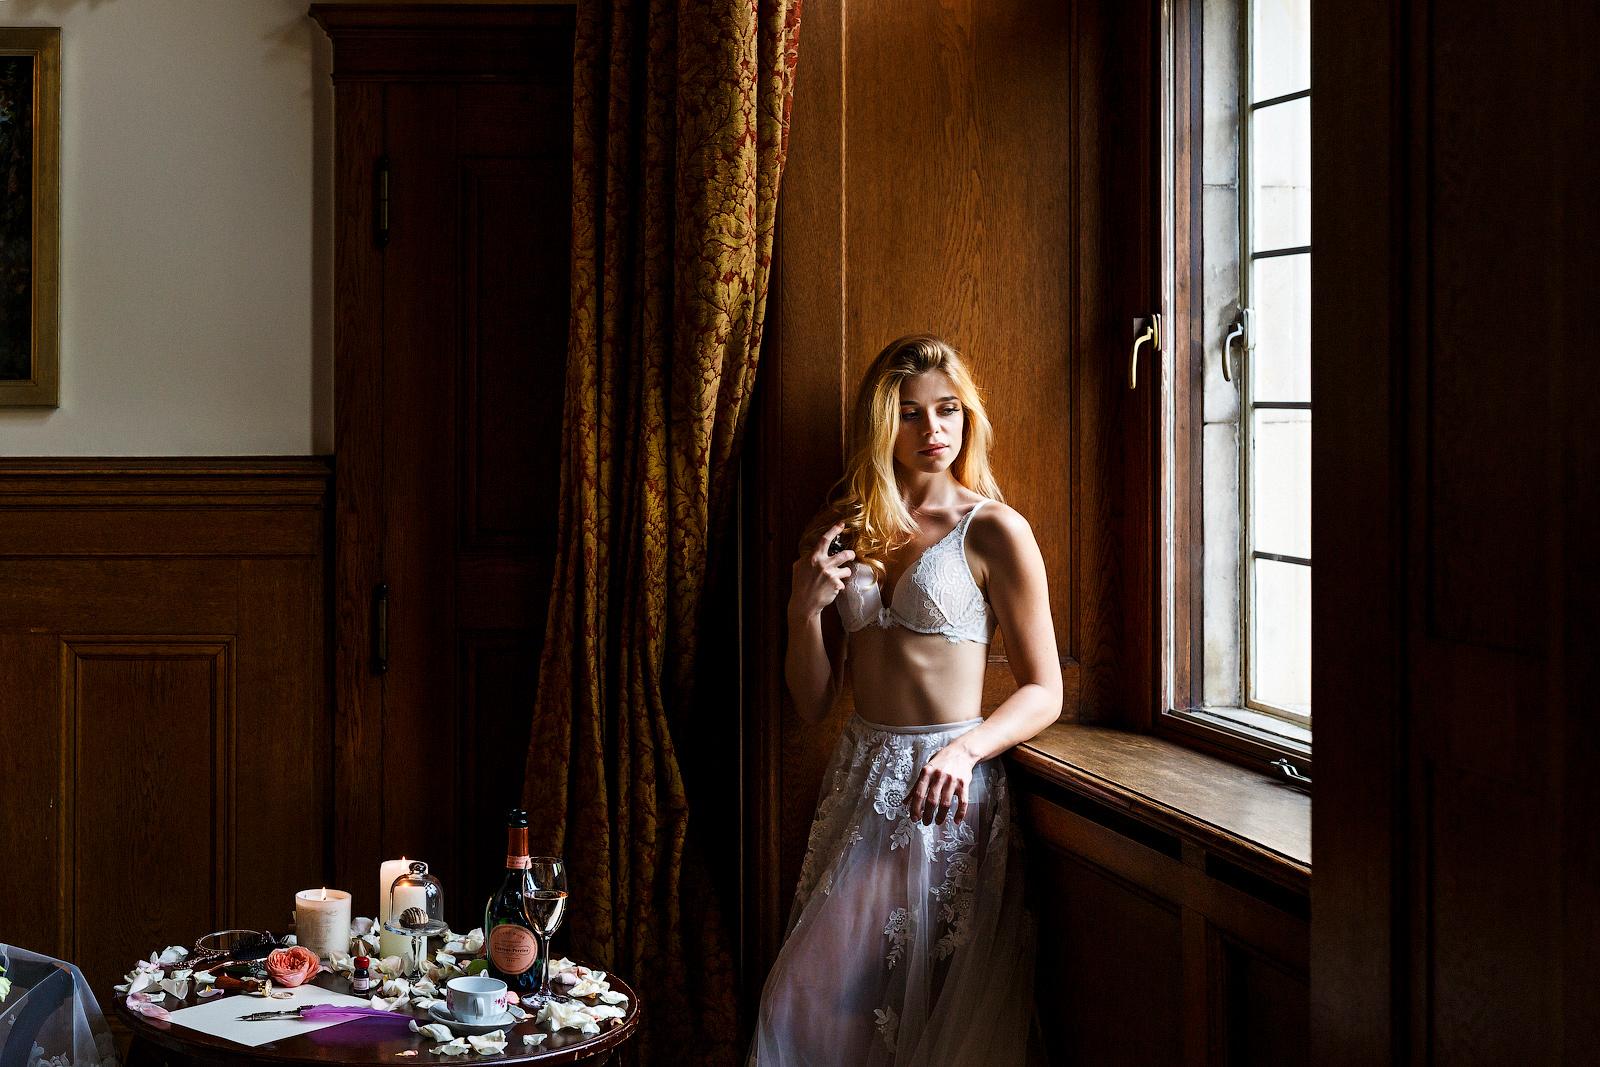 Braut-Boudoir Shooting im Luxushotel Kronberg im Taunus